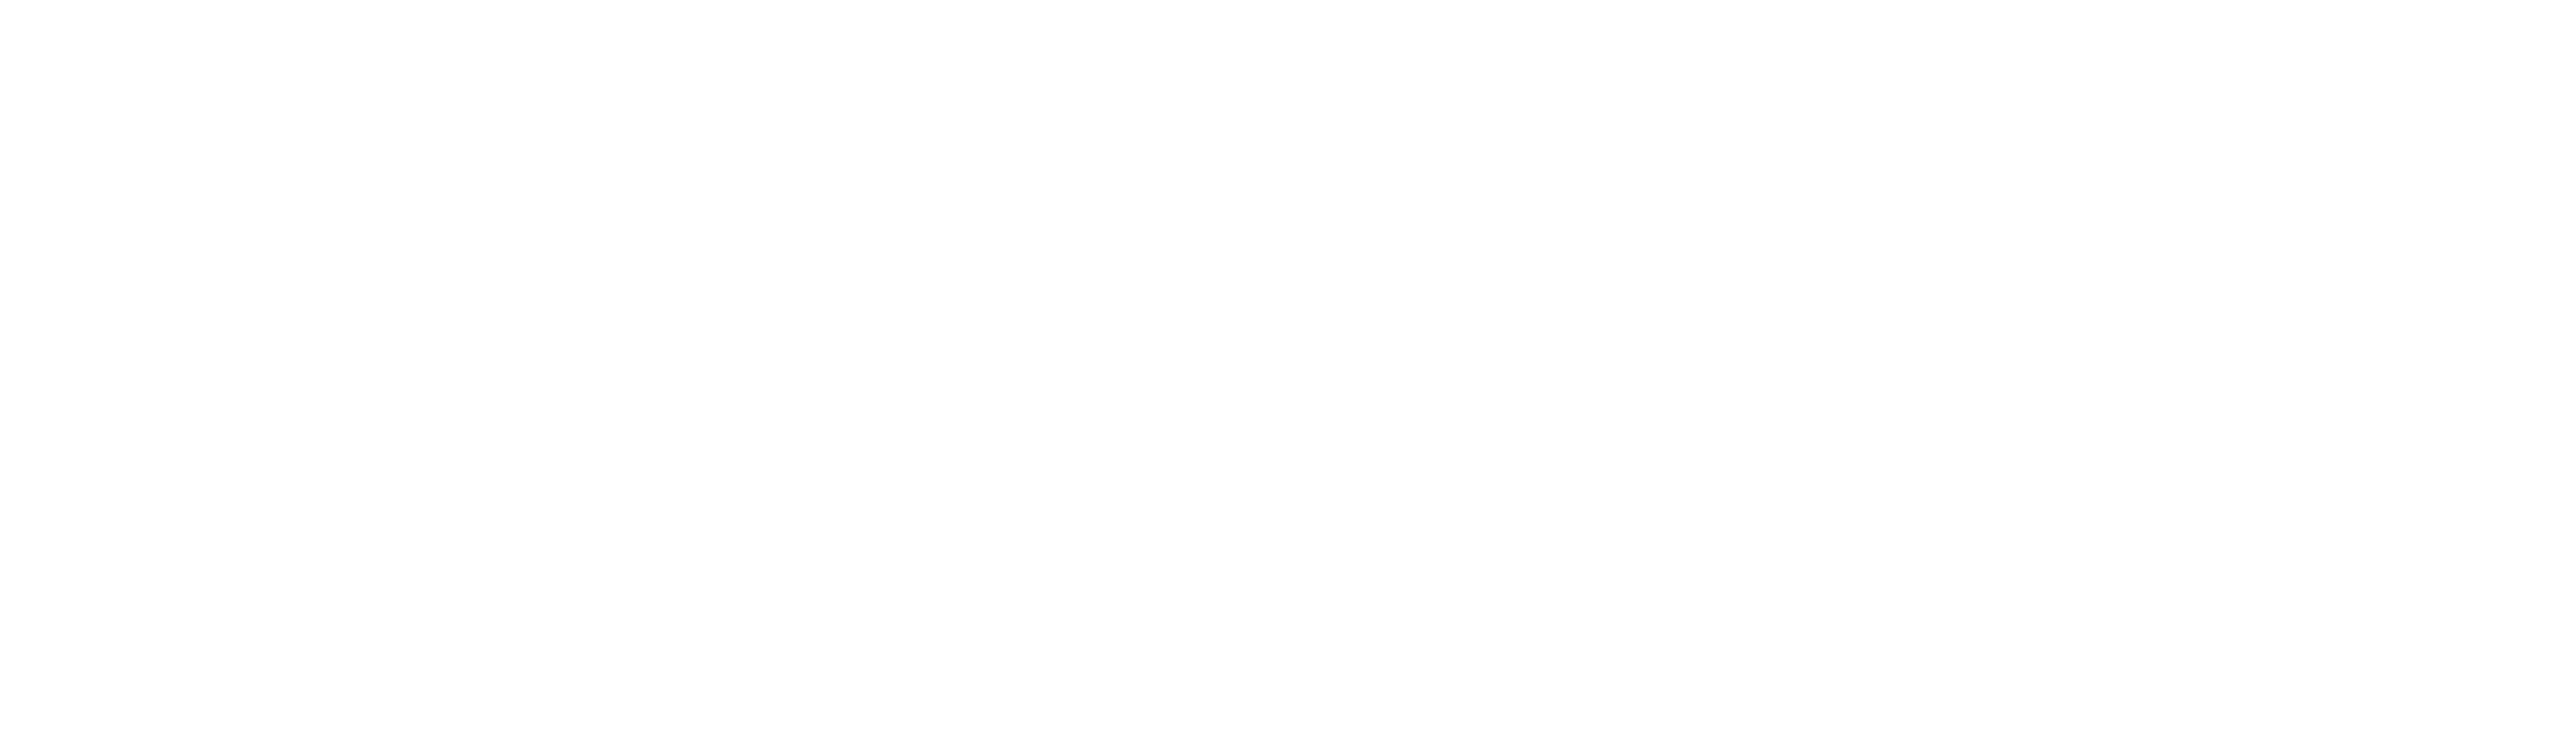 Editshare - White